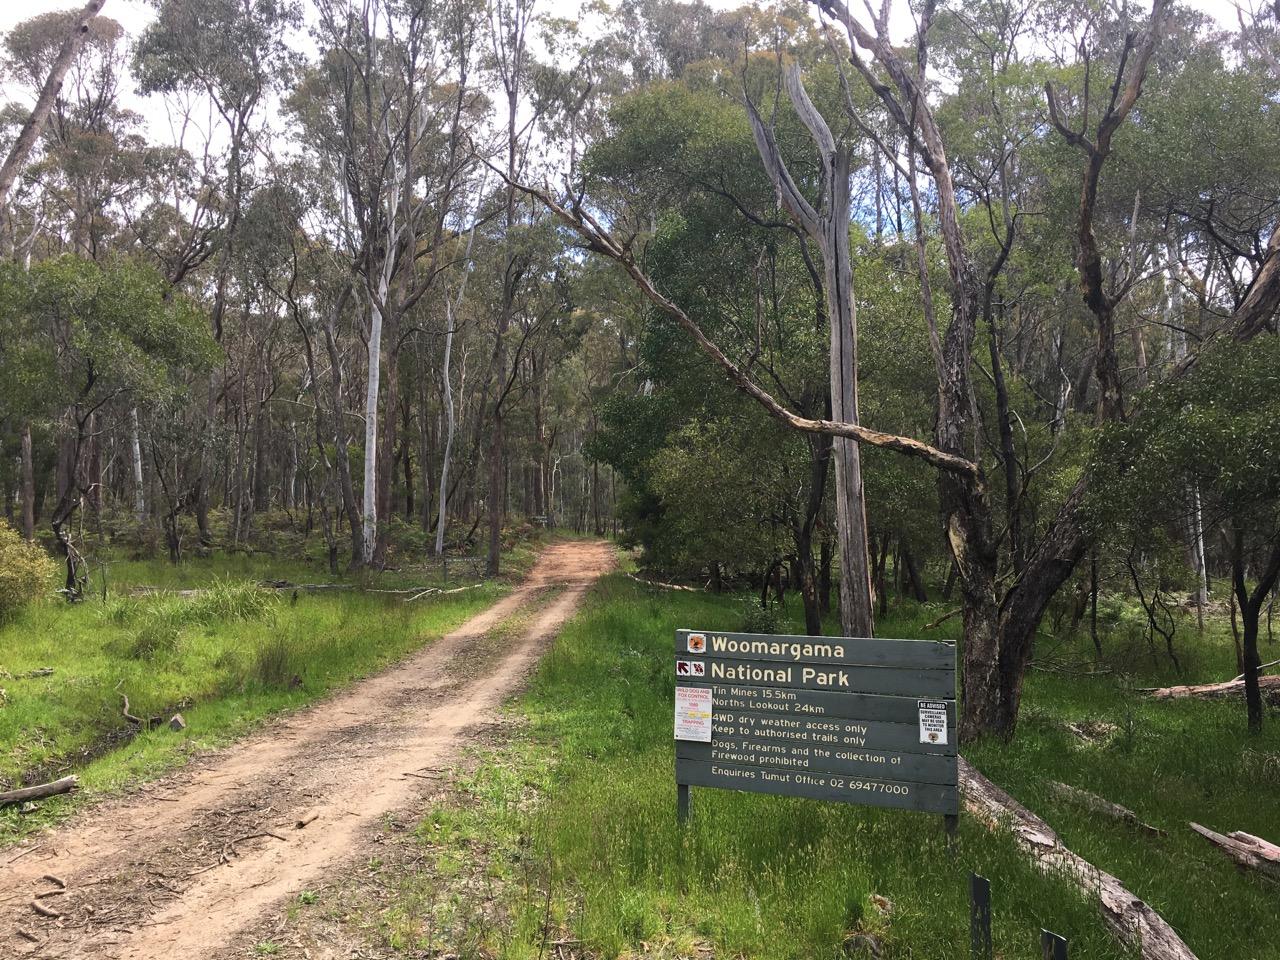 Woomargama National Park (northern entrance)